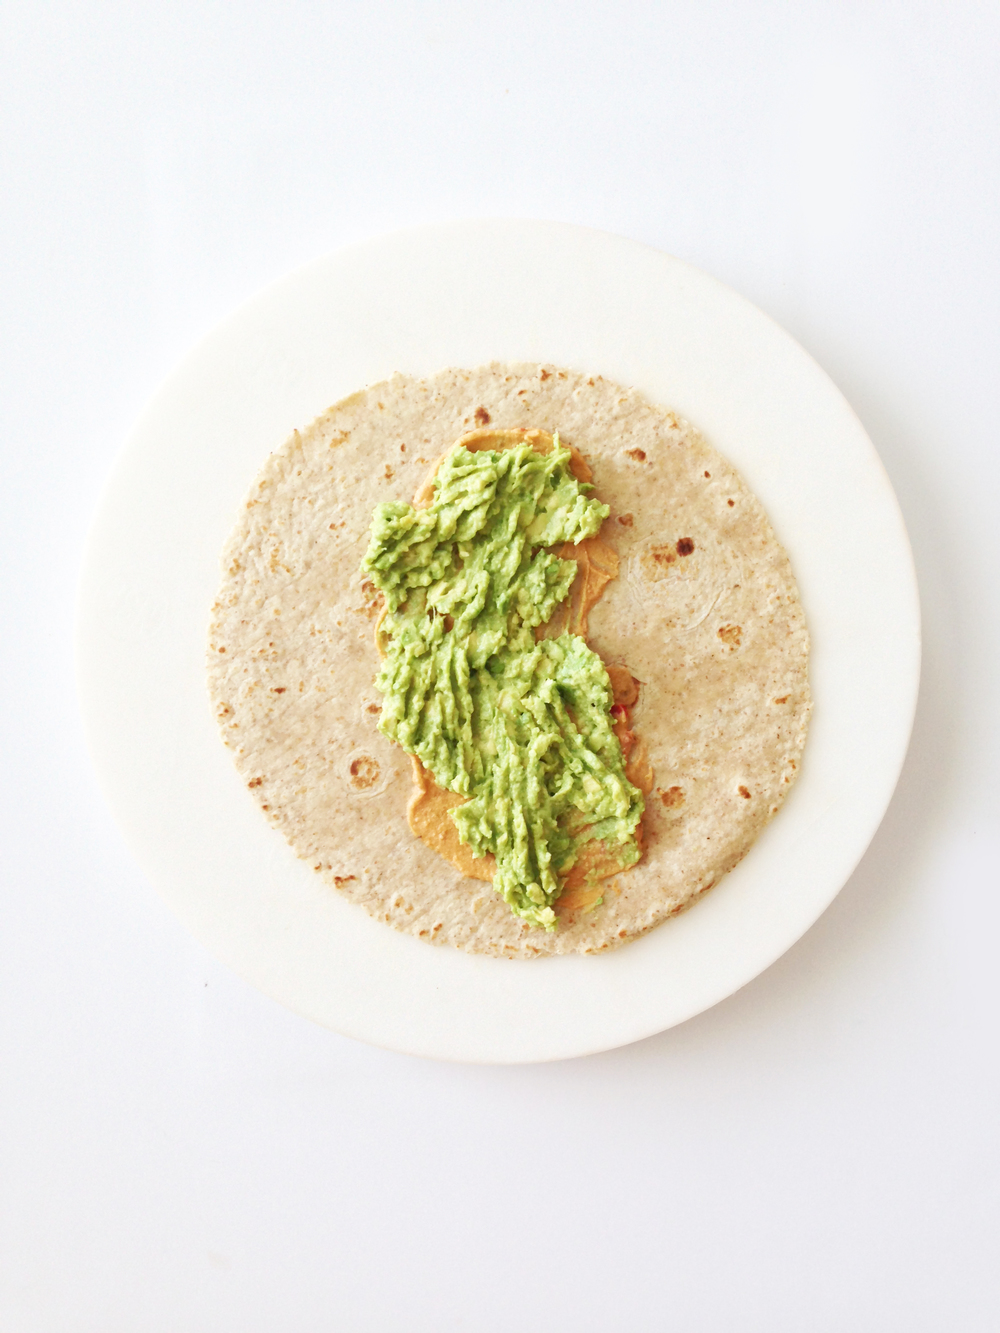 Mashed Avocado With Hummus Recipes — Dishmaps